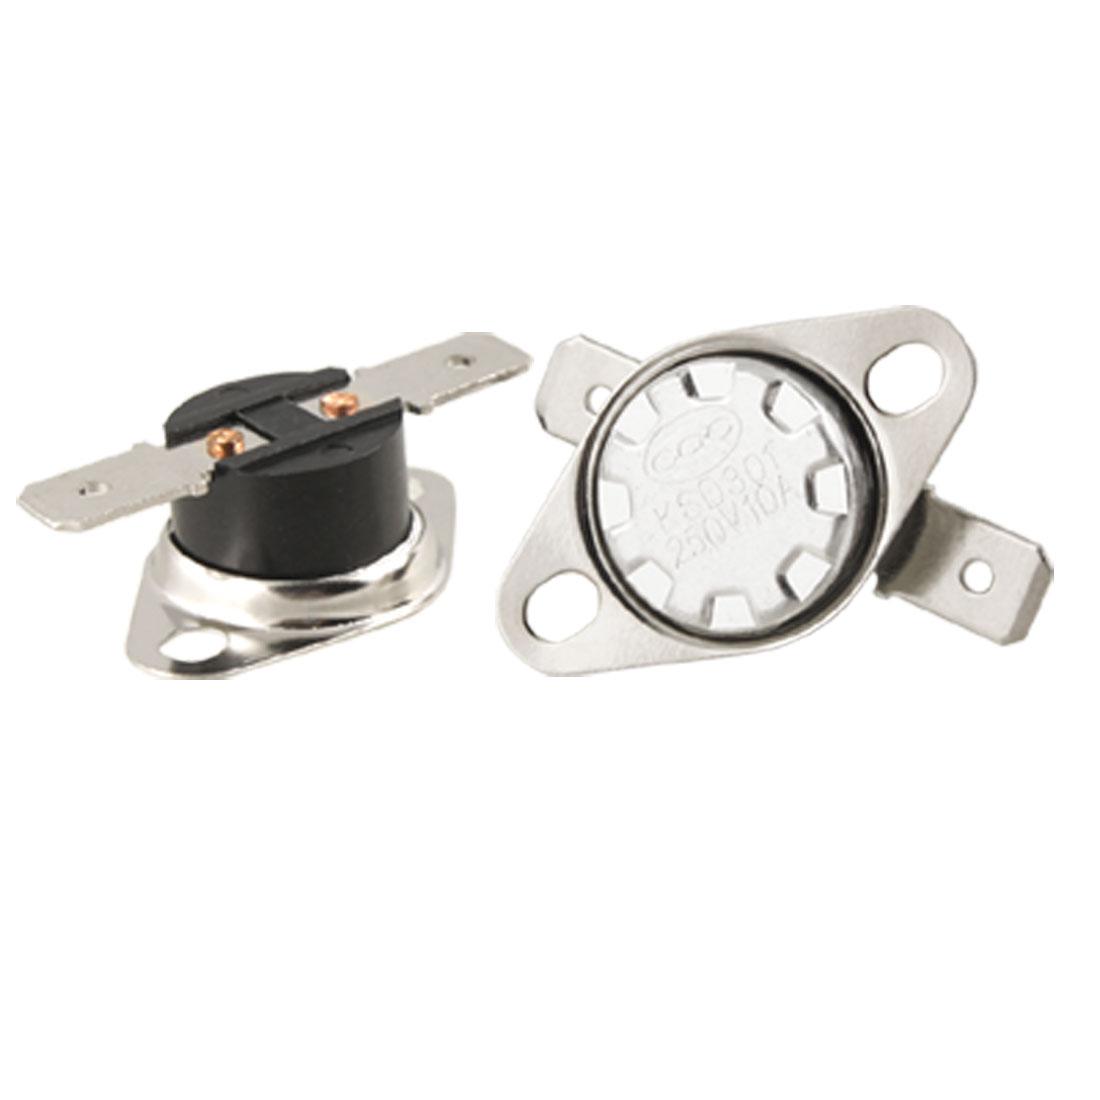 KSD301 120 Celsius Normal Close Temperature Control Switch Thermostat 5 Pcs